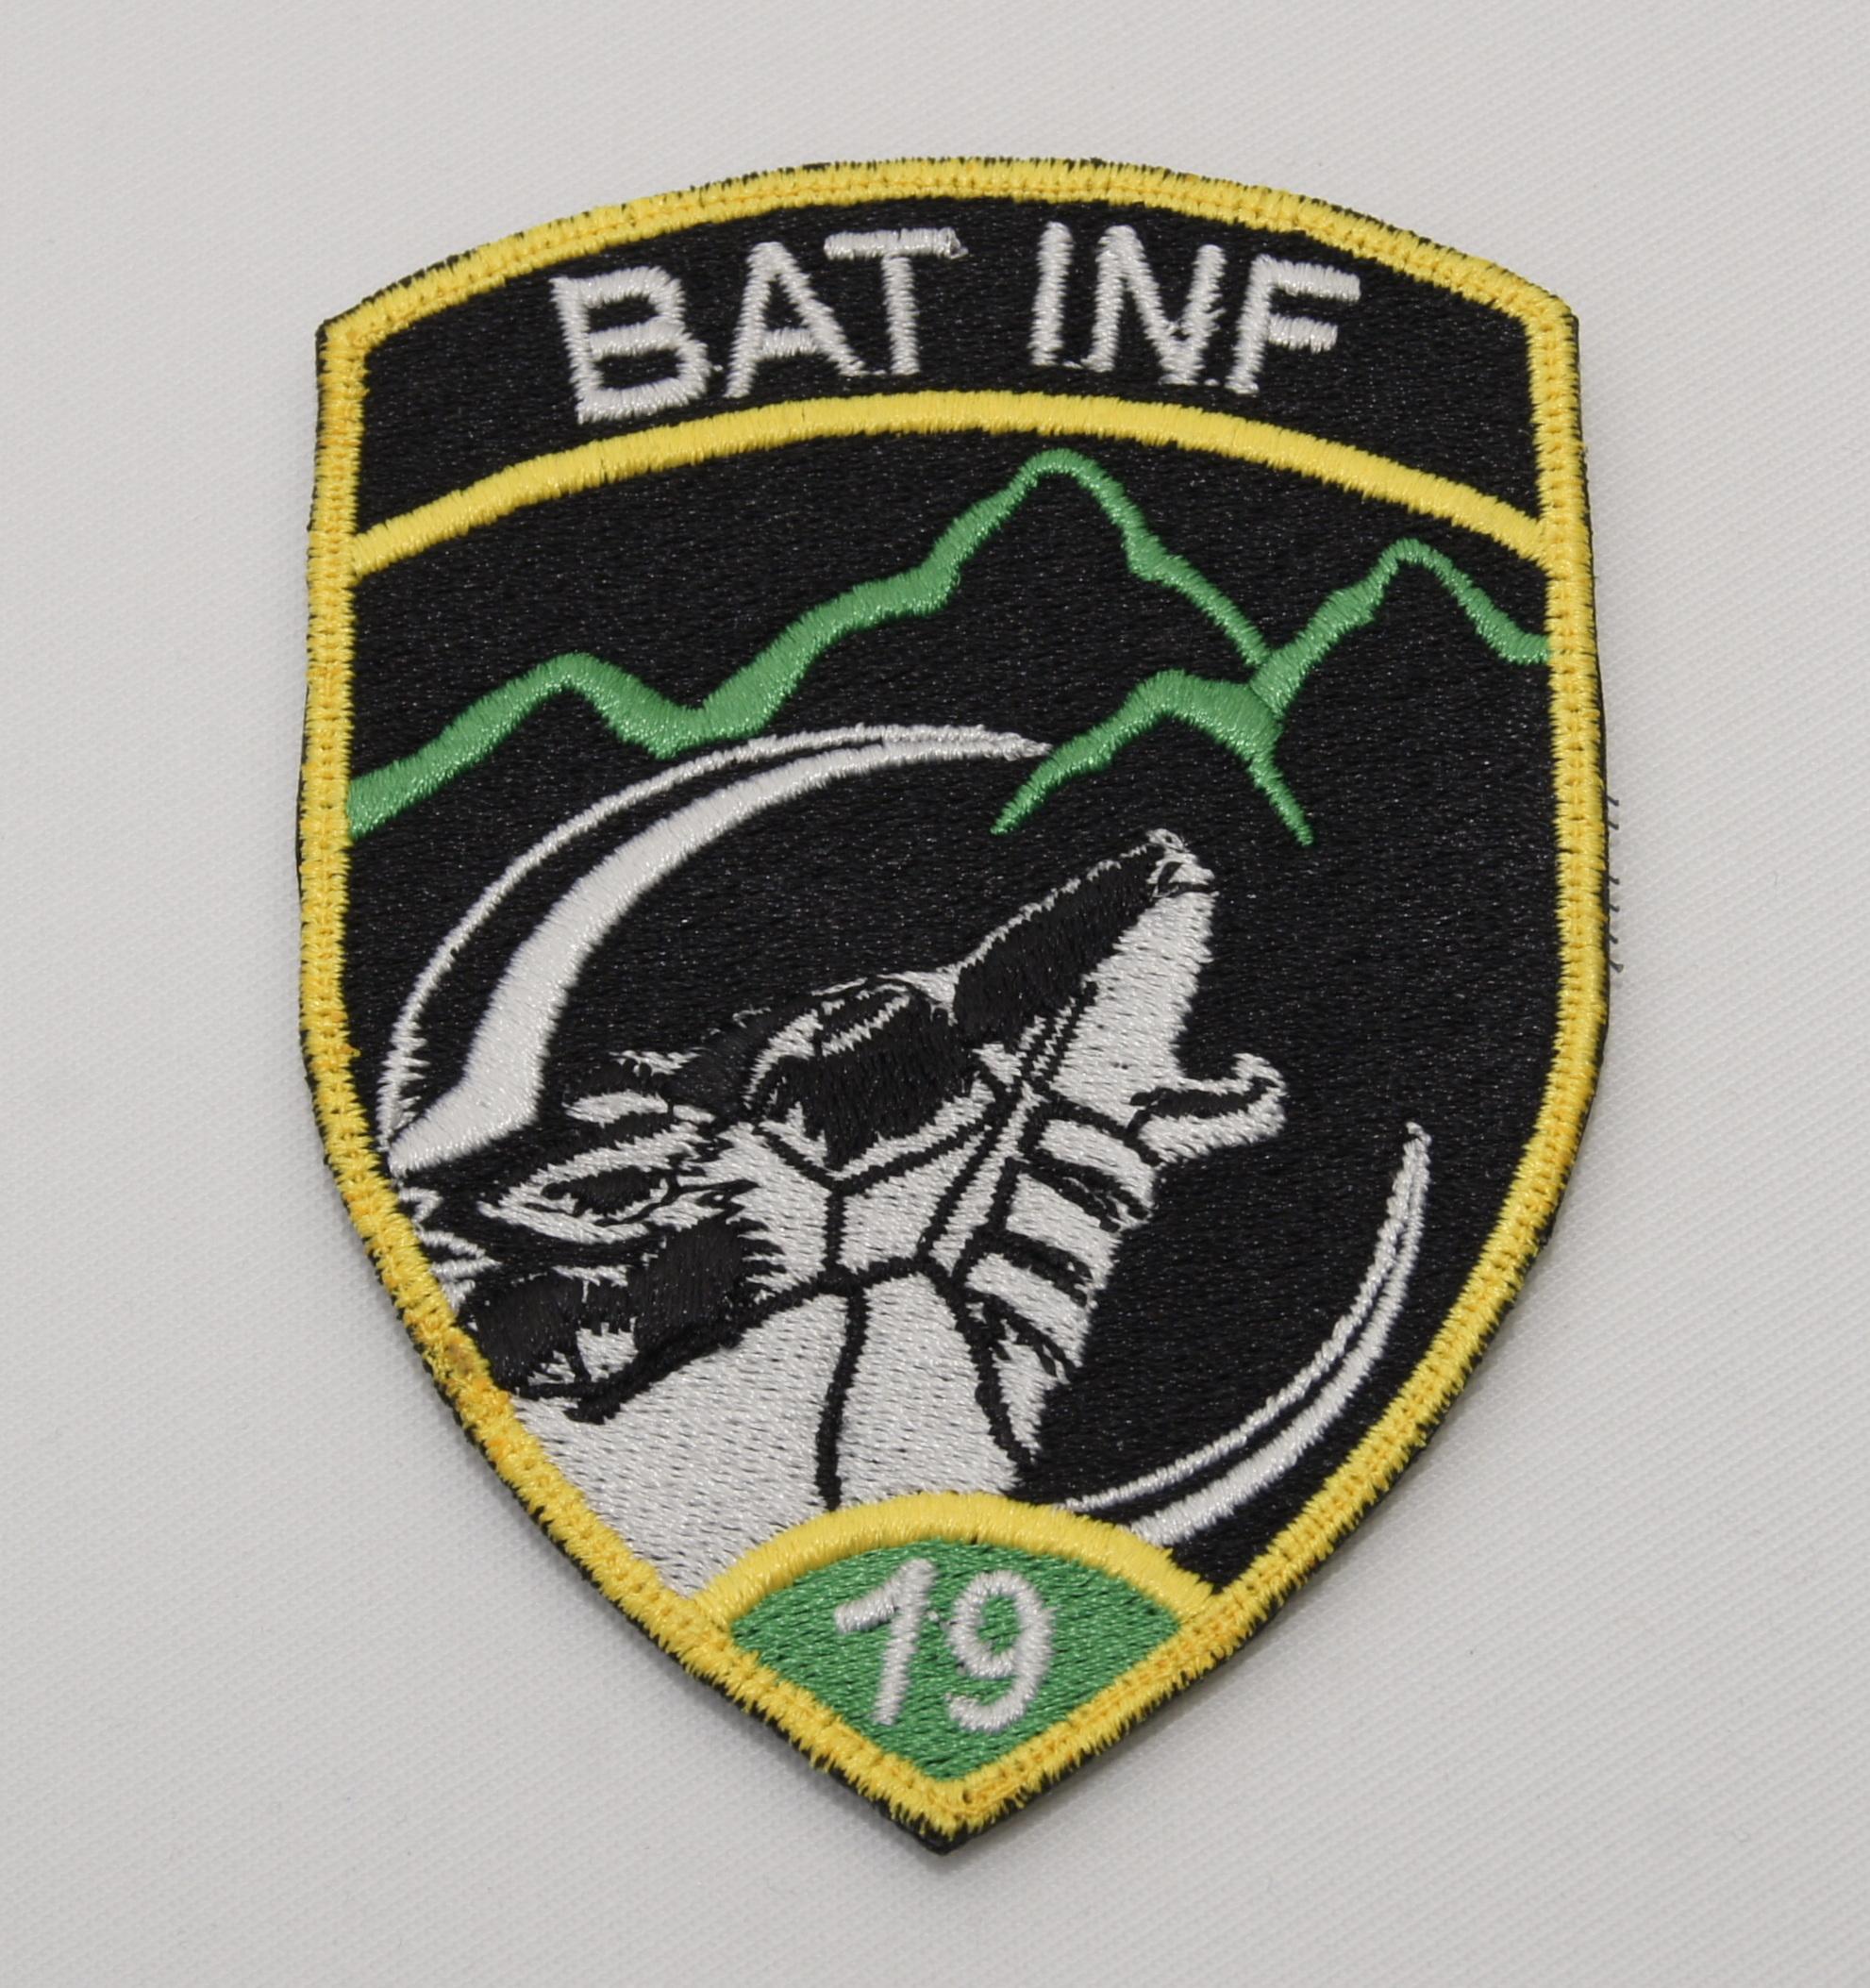 BAT INF 19